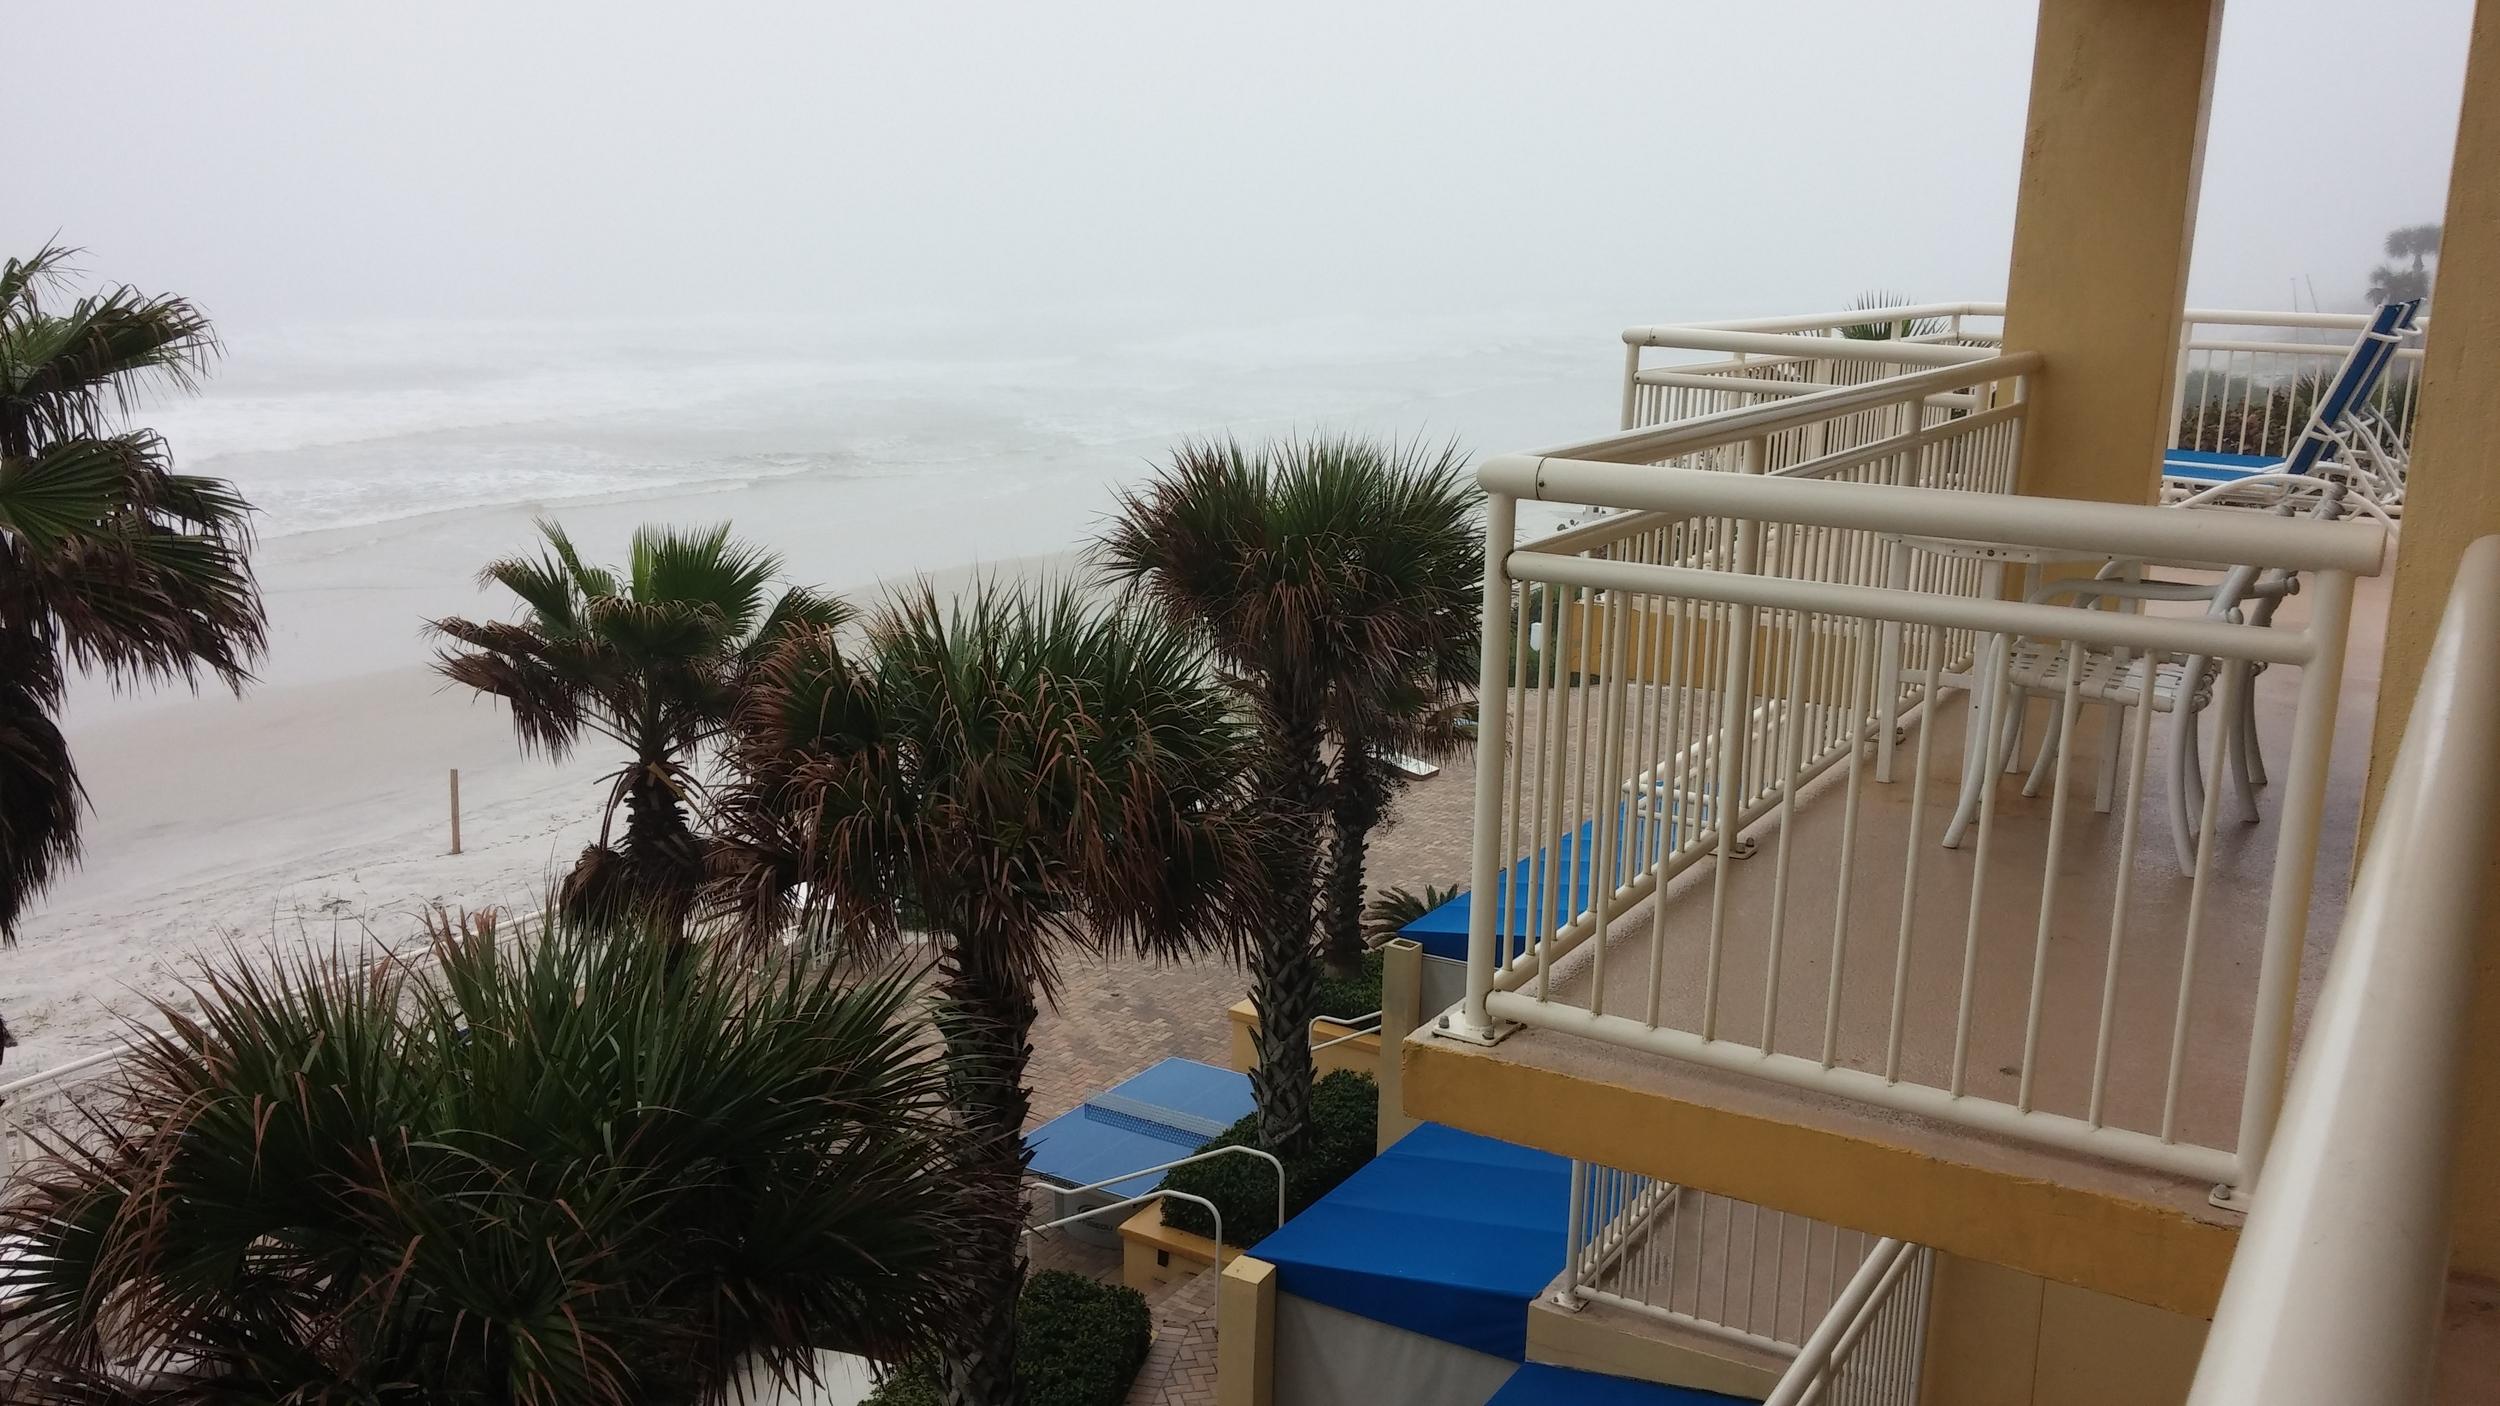 2016-01-08 The Shores Resort and Spa, Daytona Beach FL 5.jpg